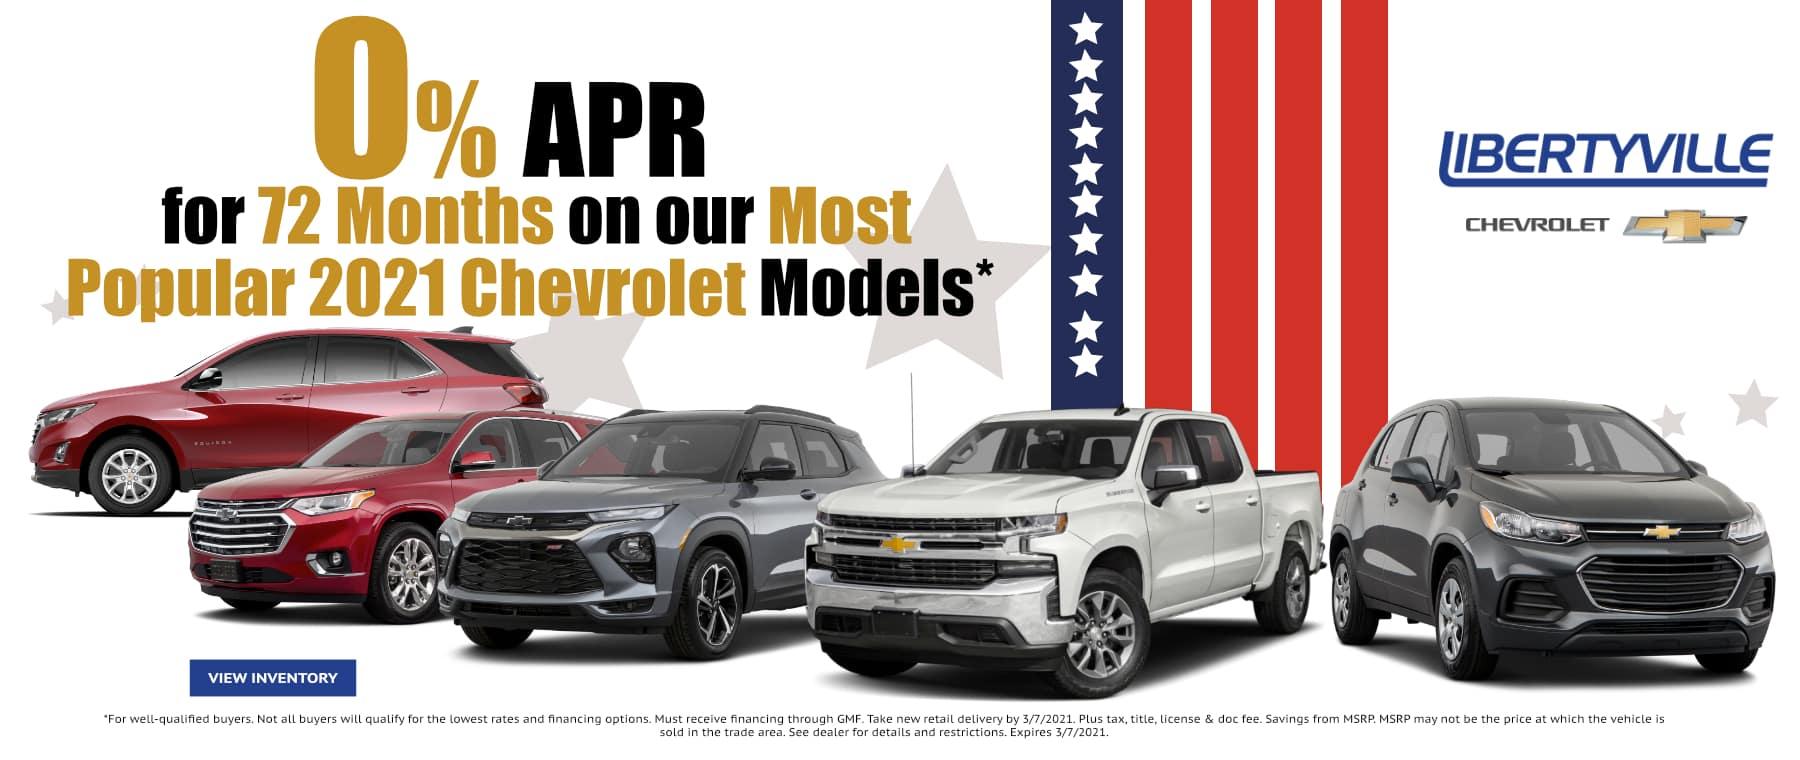 R_February_2021_General_Libertyville_Chevrolet